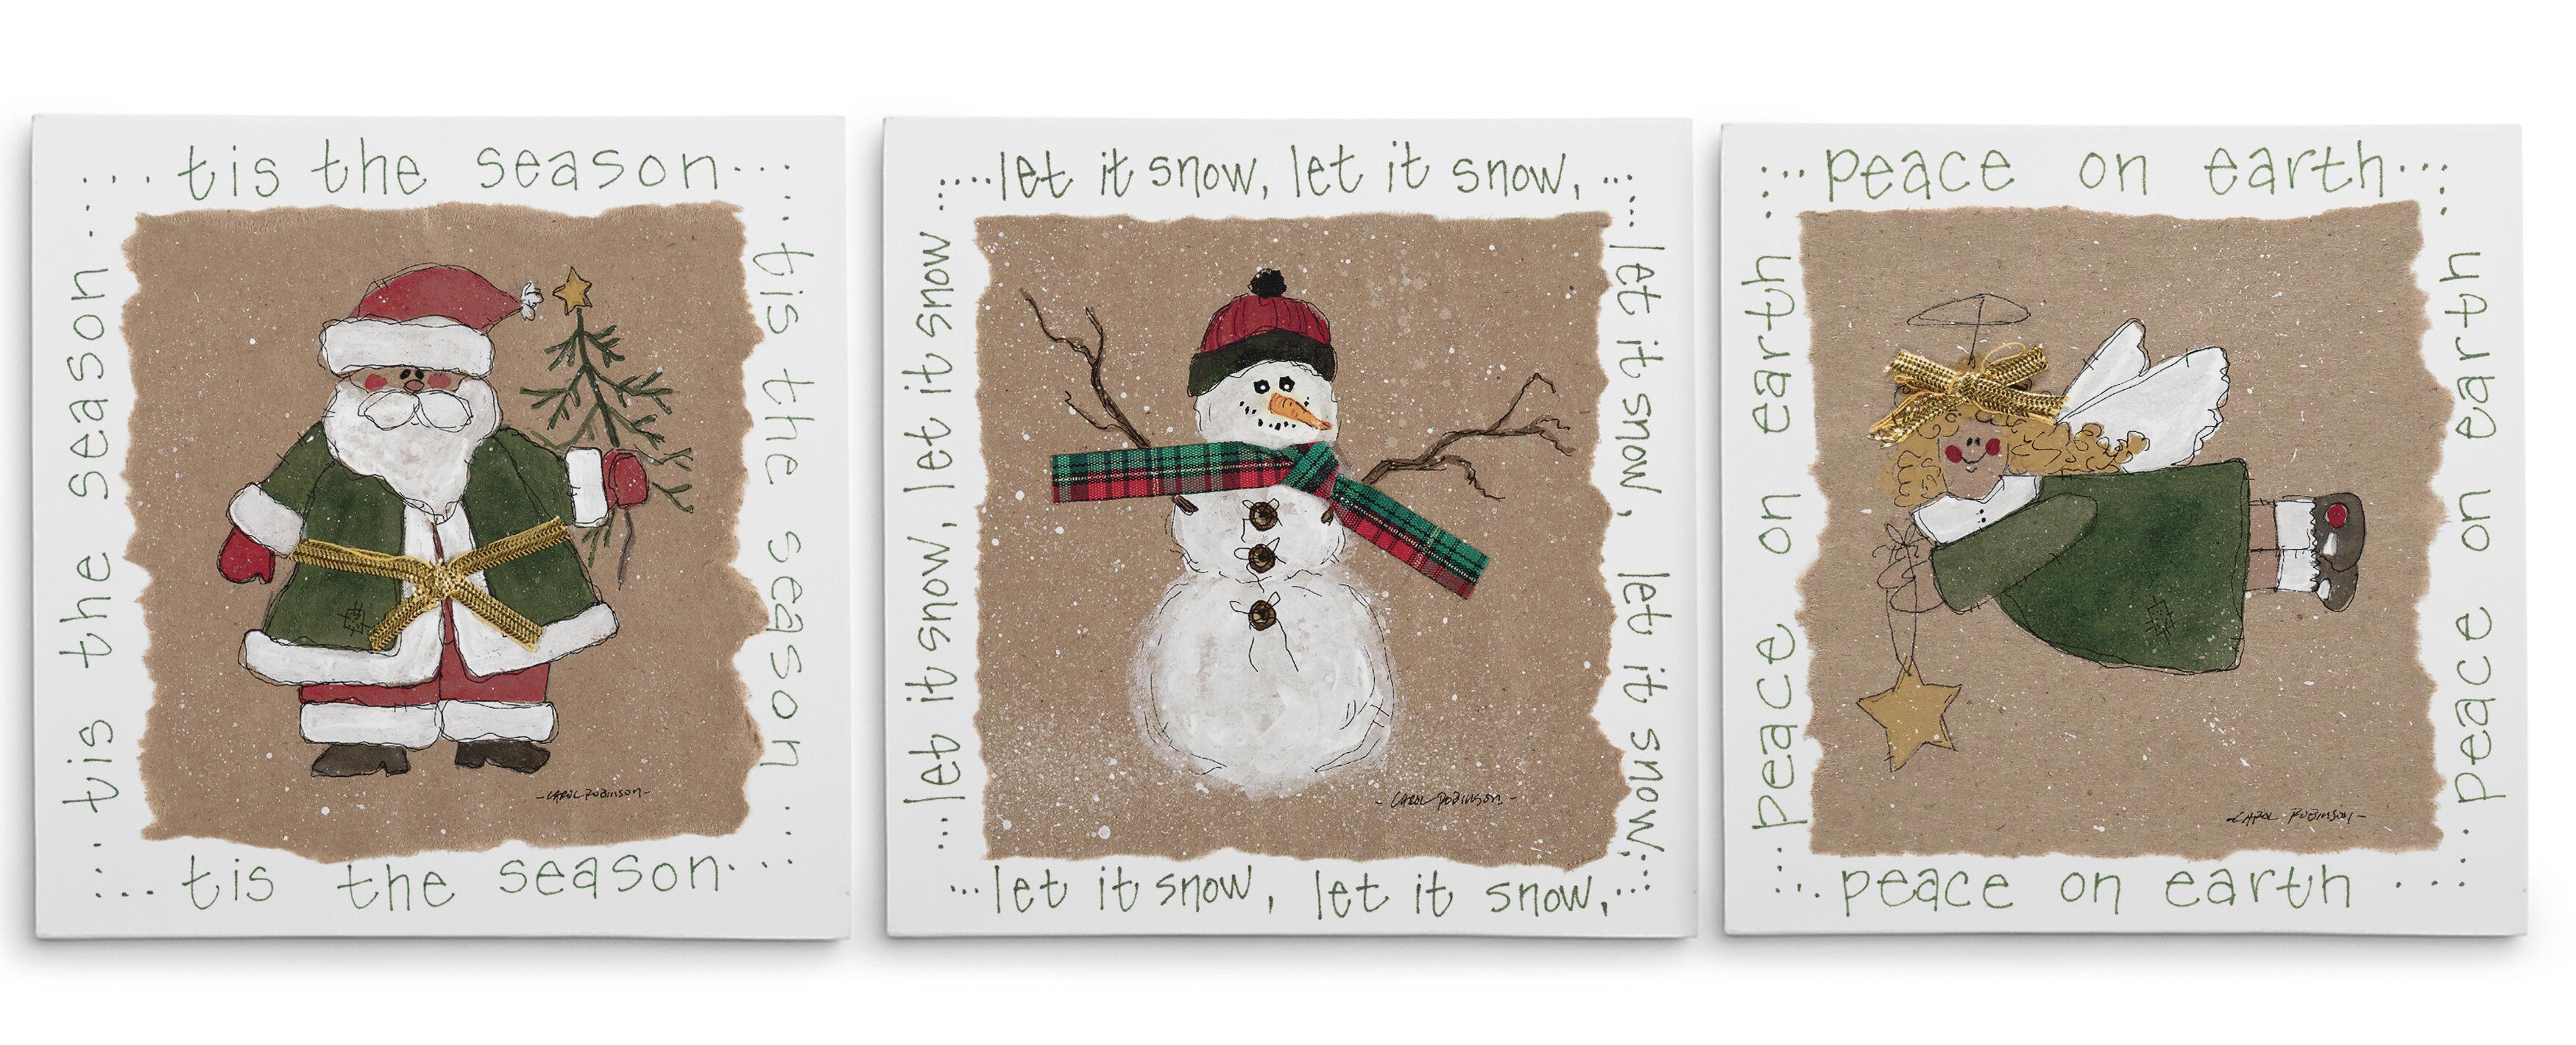 3 Piece Christmas Wall Art You Ll Love In 2021 Wayfair